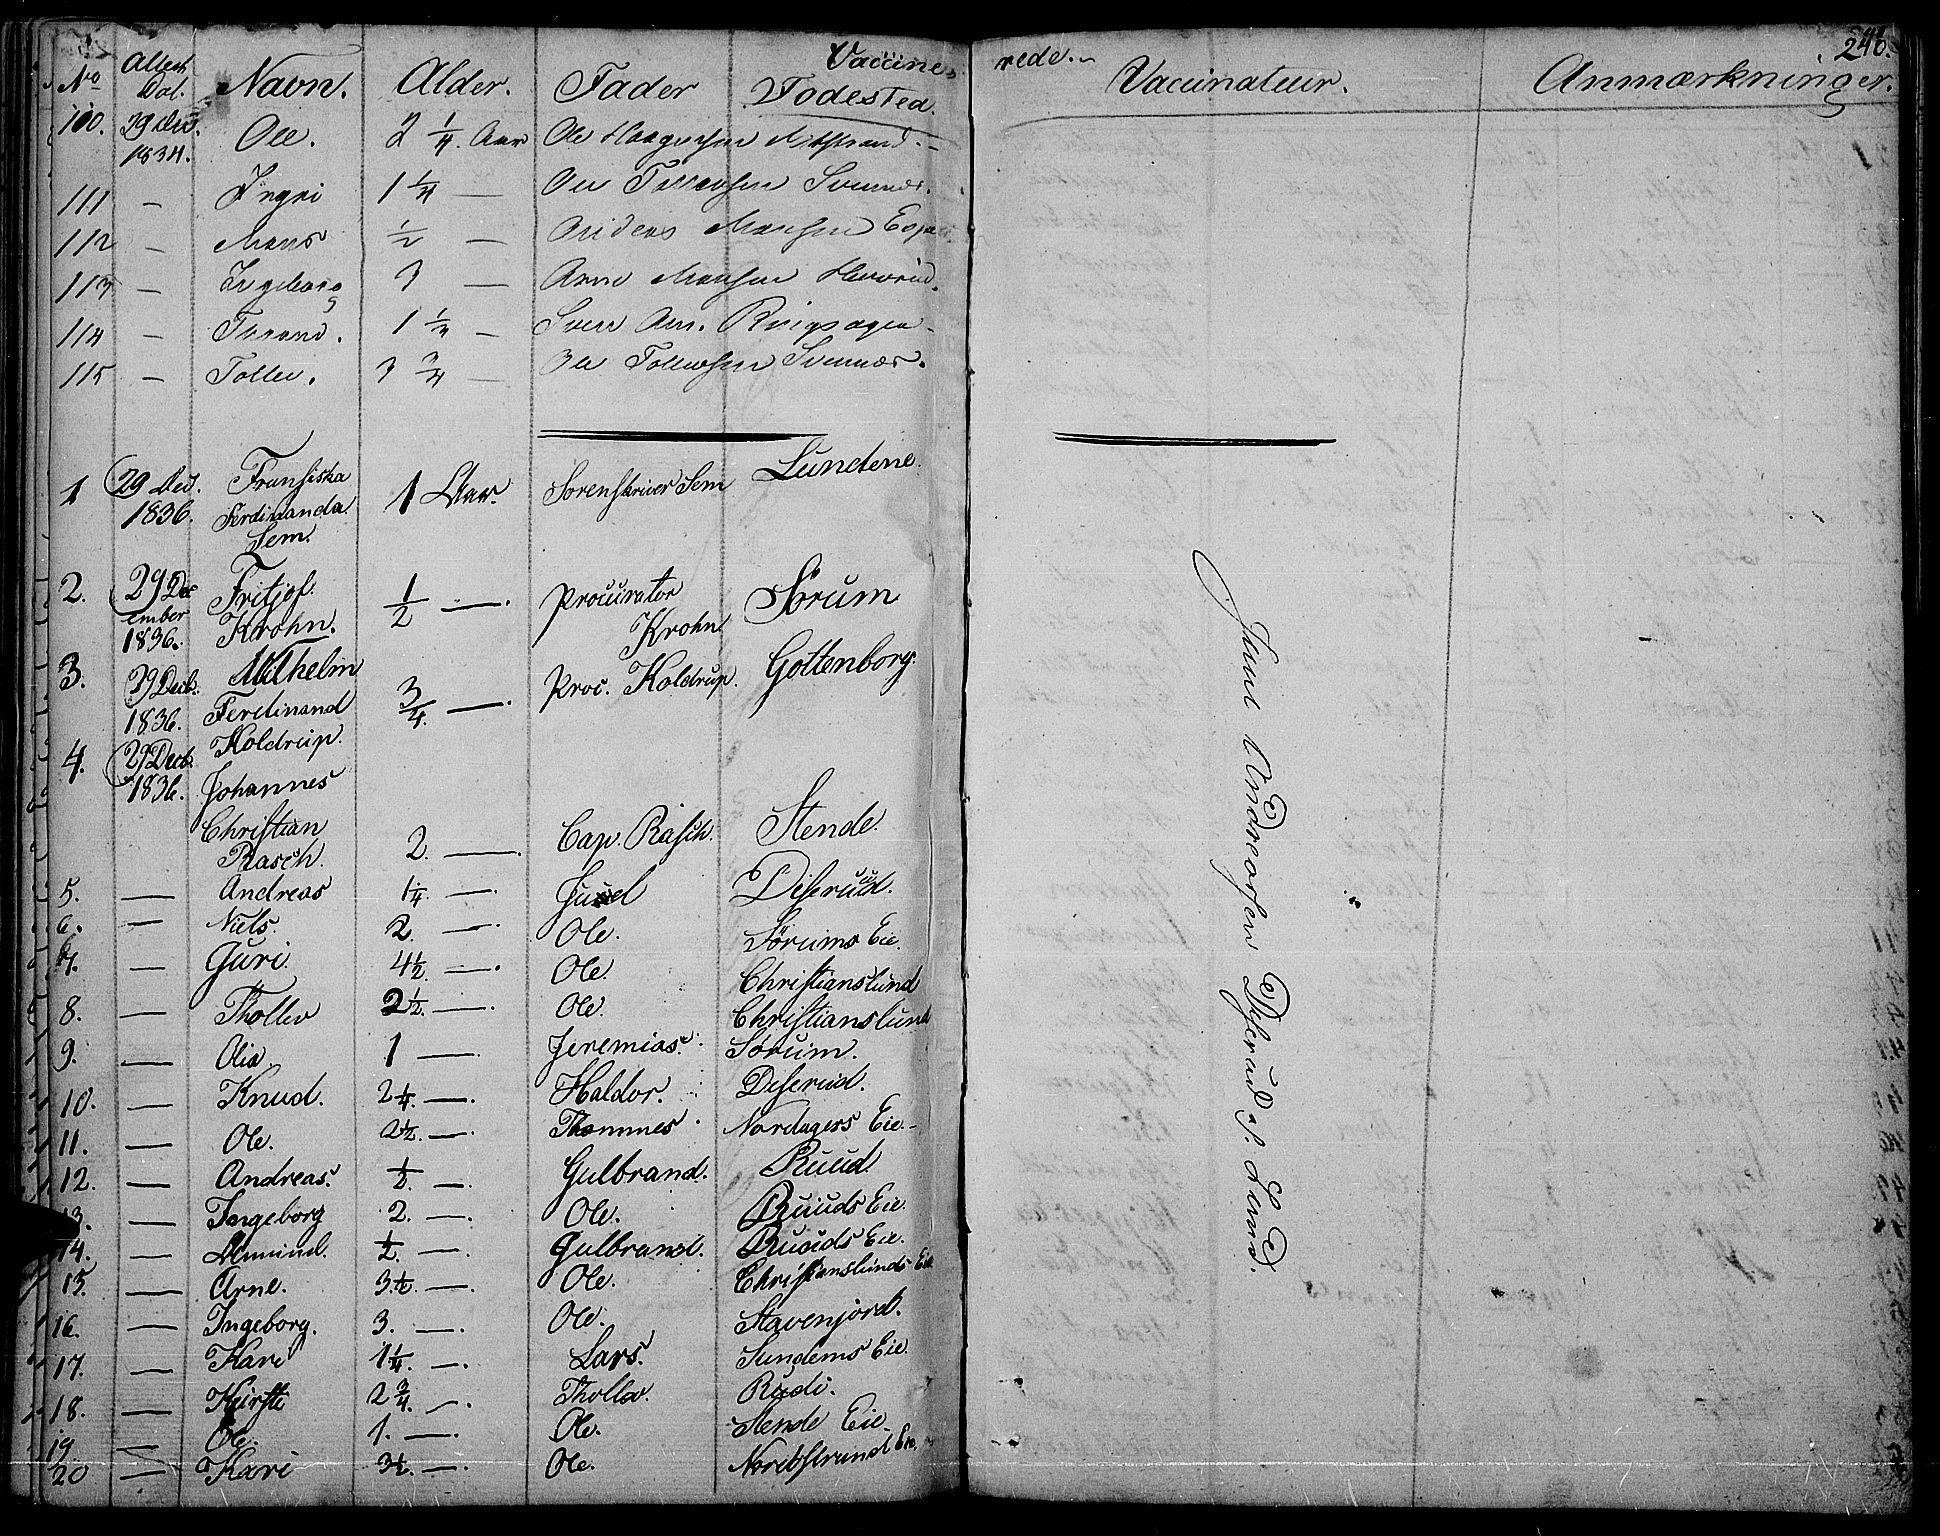 SAH, Nord-Aurdal prestekontor, Ministerialbok nr. 3, 1828-1841, s. 240